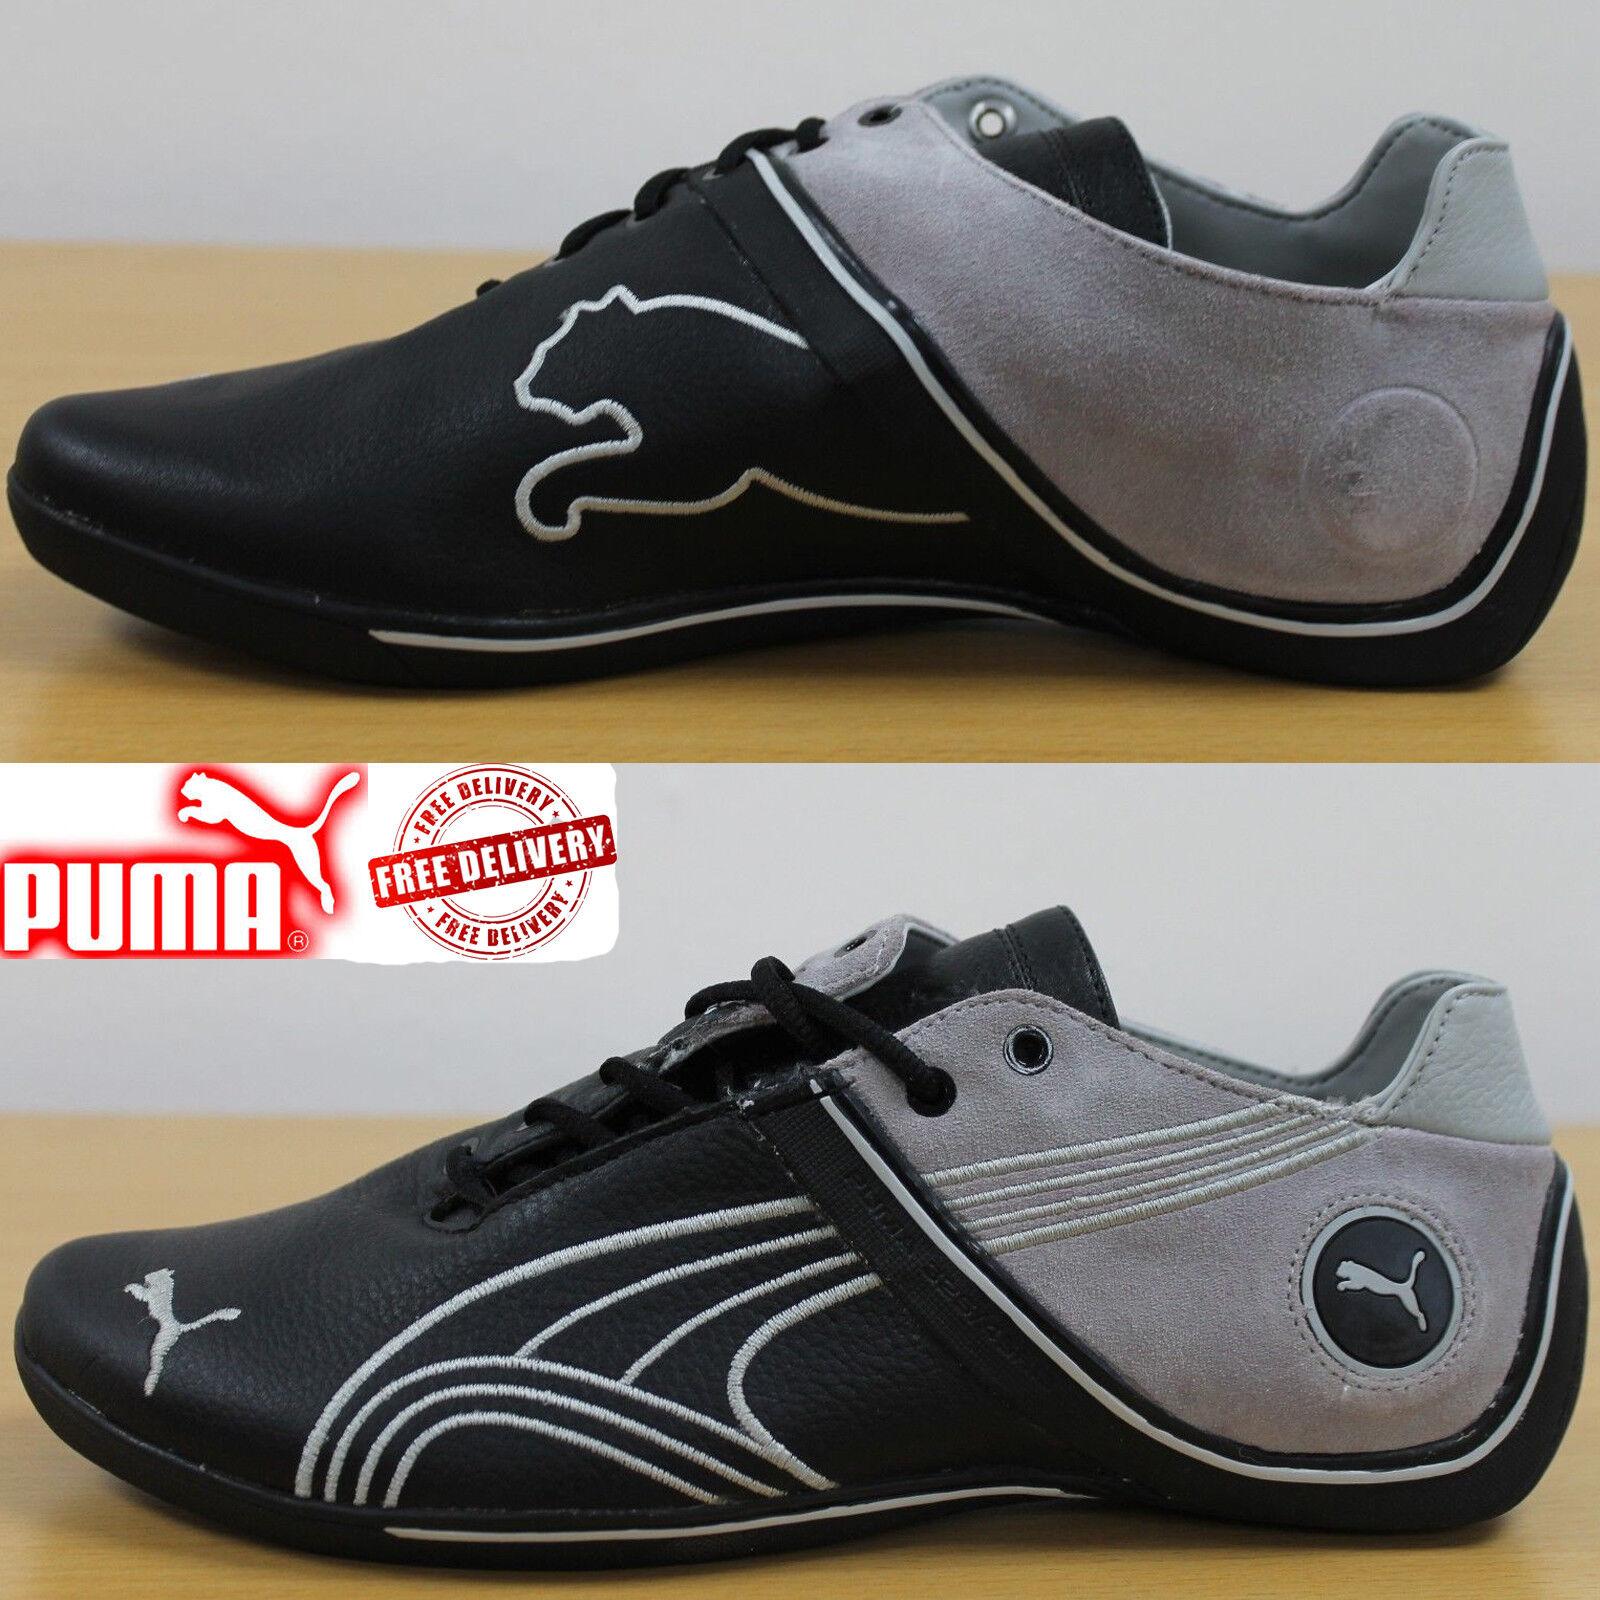 Details about PUMA Future Cat Men's Boy's Trainers Remix NT Leather Motorsports Boots 30369204